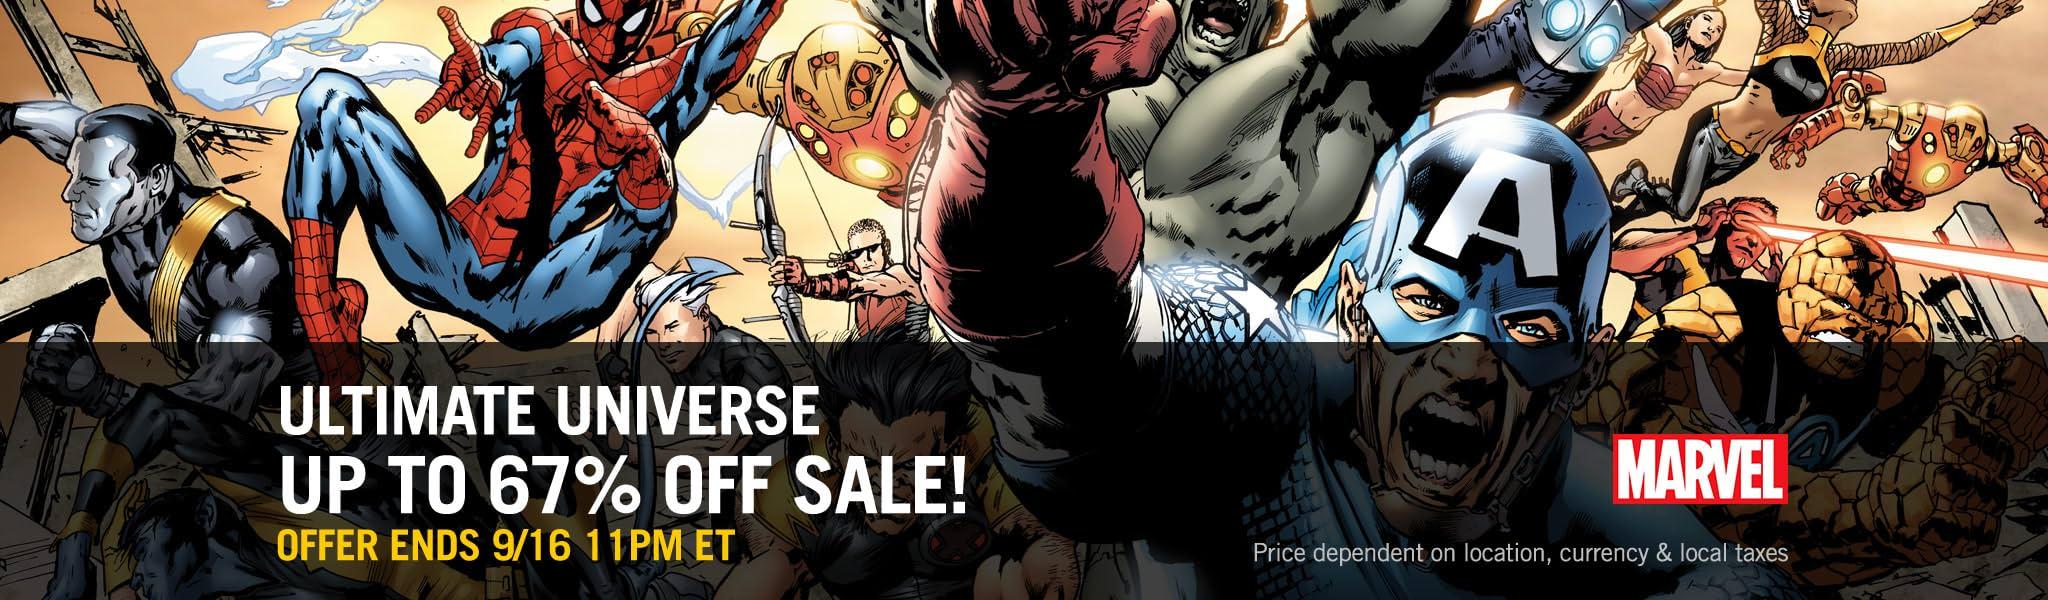 Marvel: Ultimate Universe Sale! - Comics by comiXology